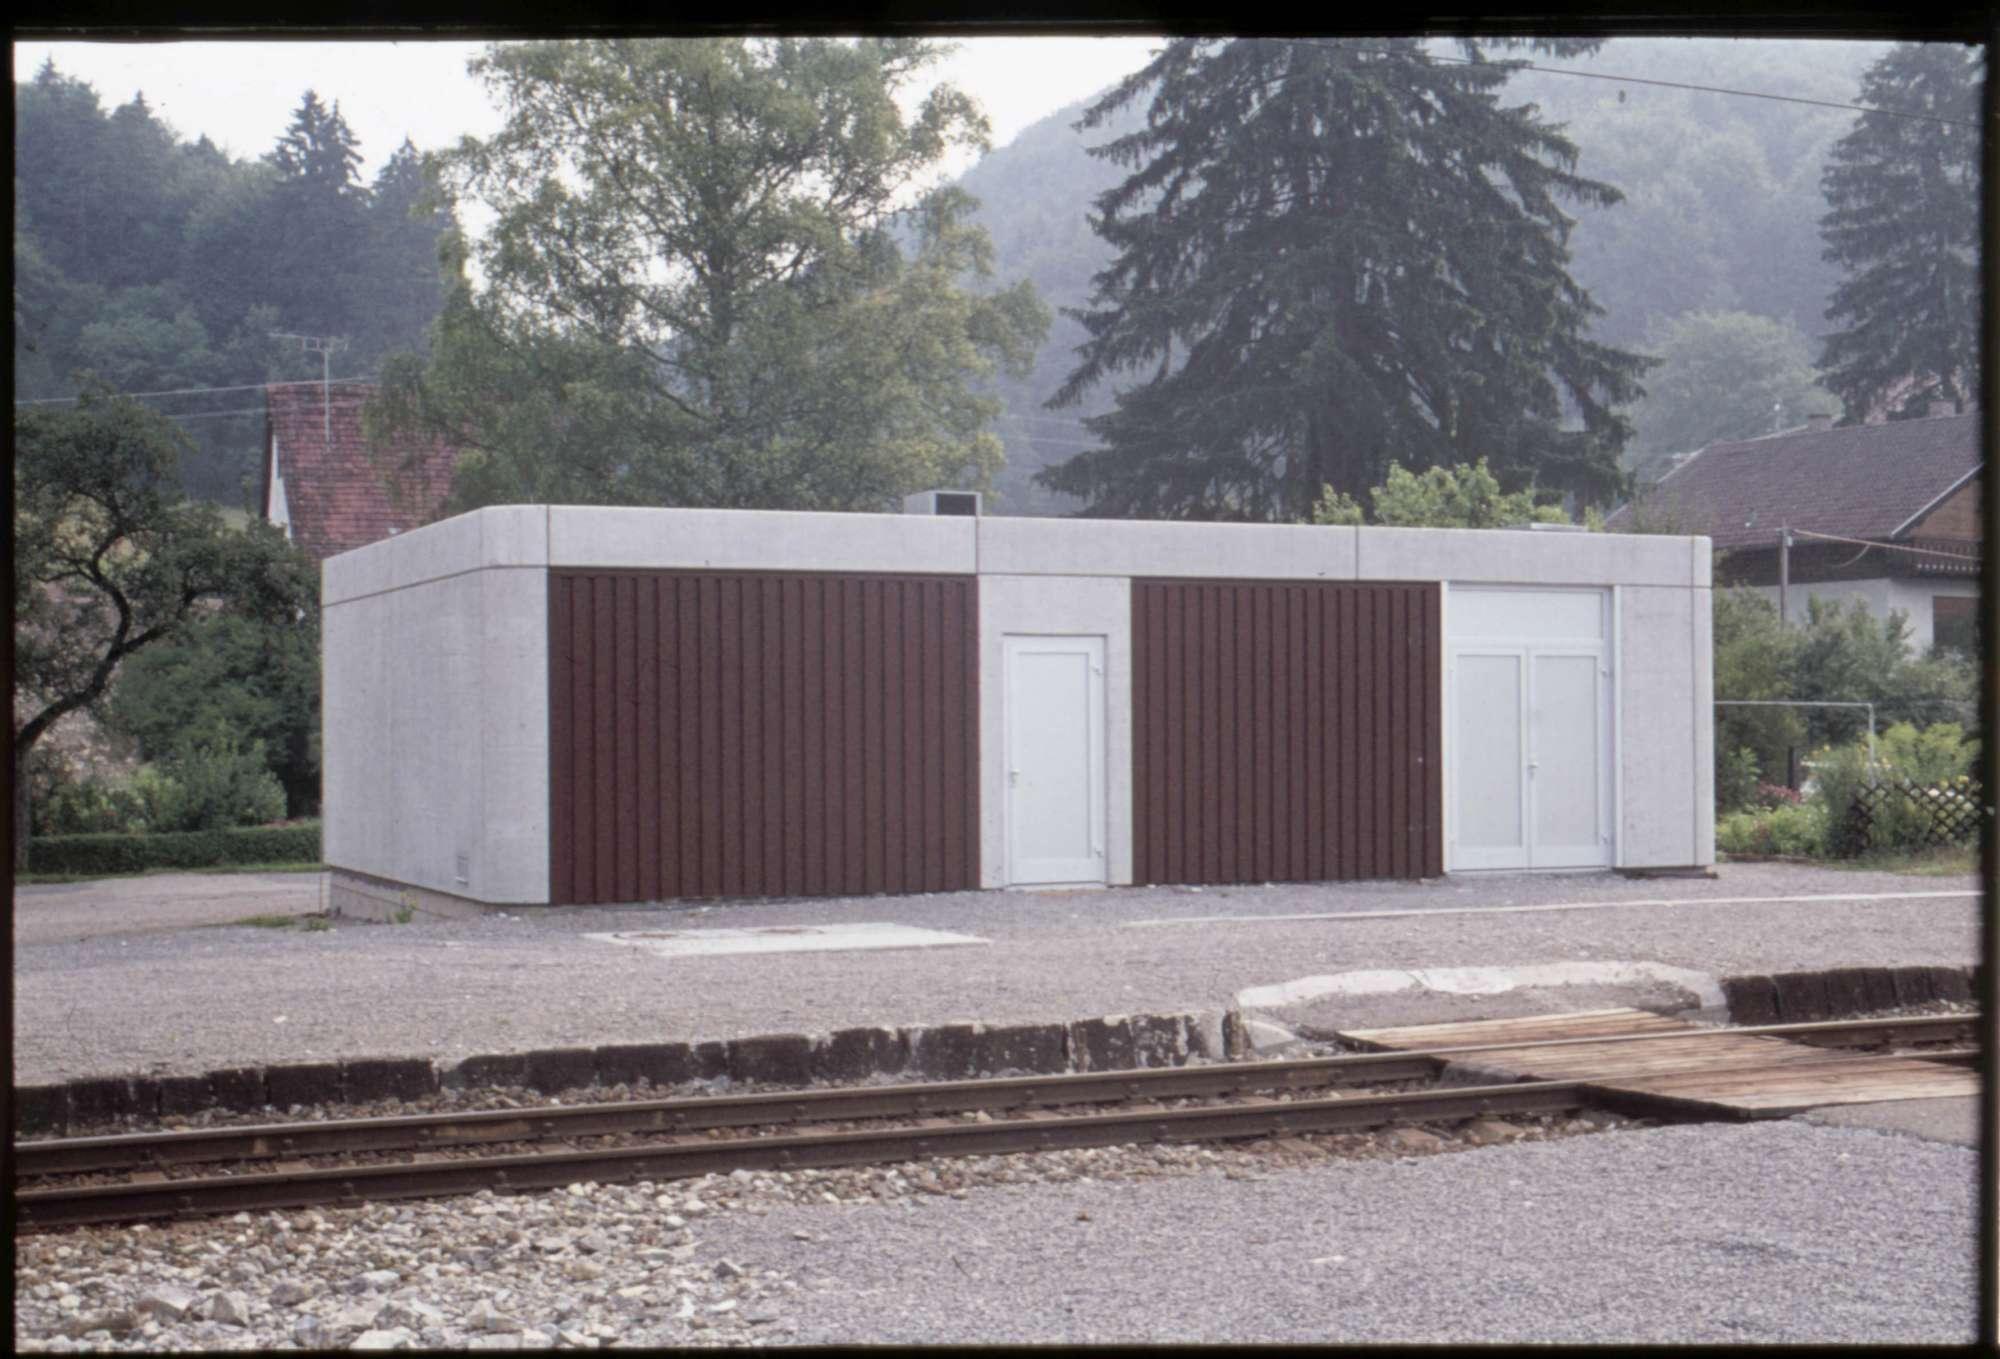 Neckarhausen: 1 Foto, Bild 1